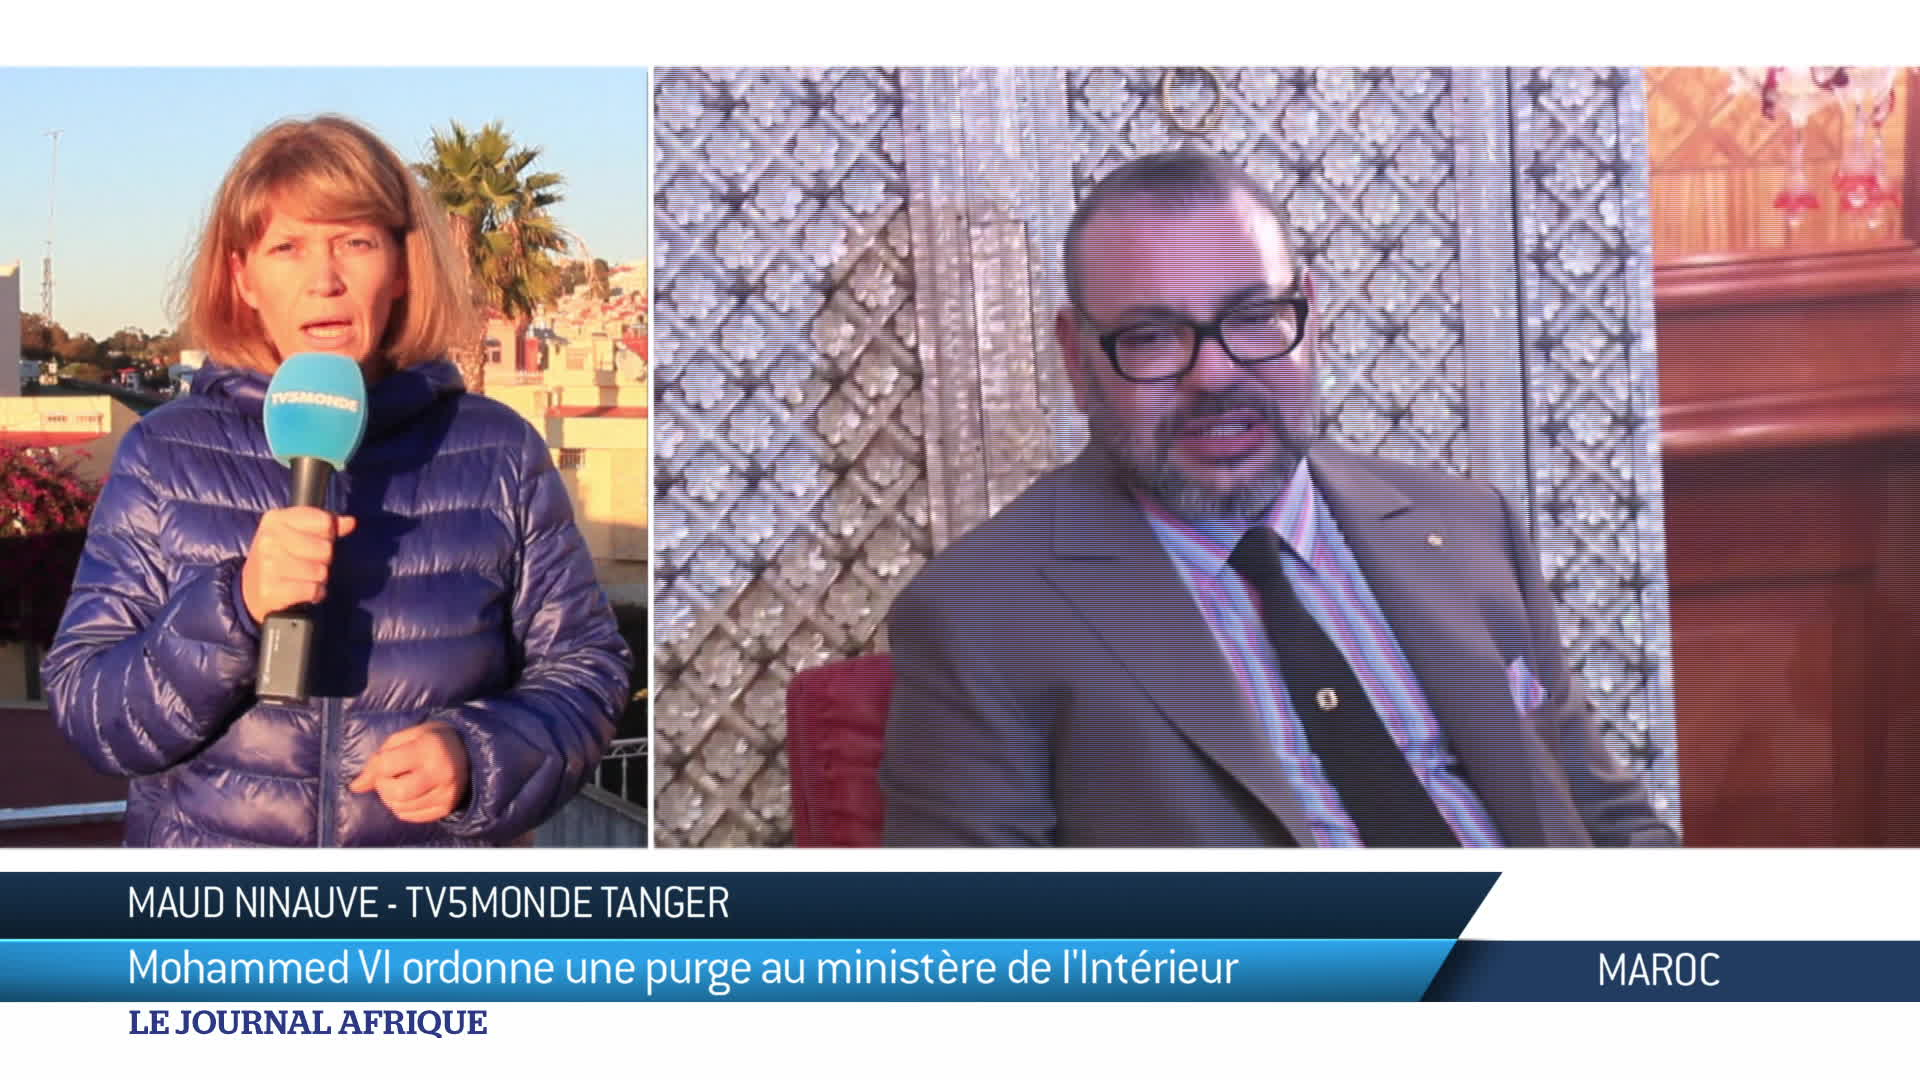 Purge royale au Maroc